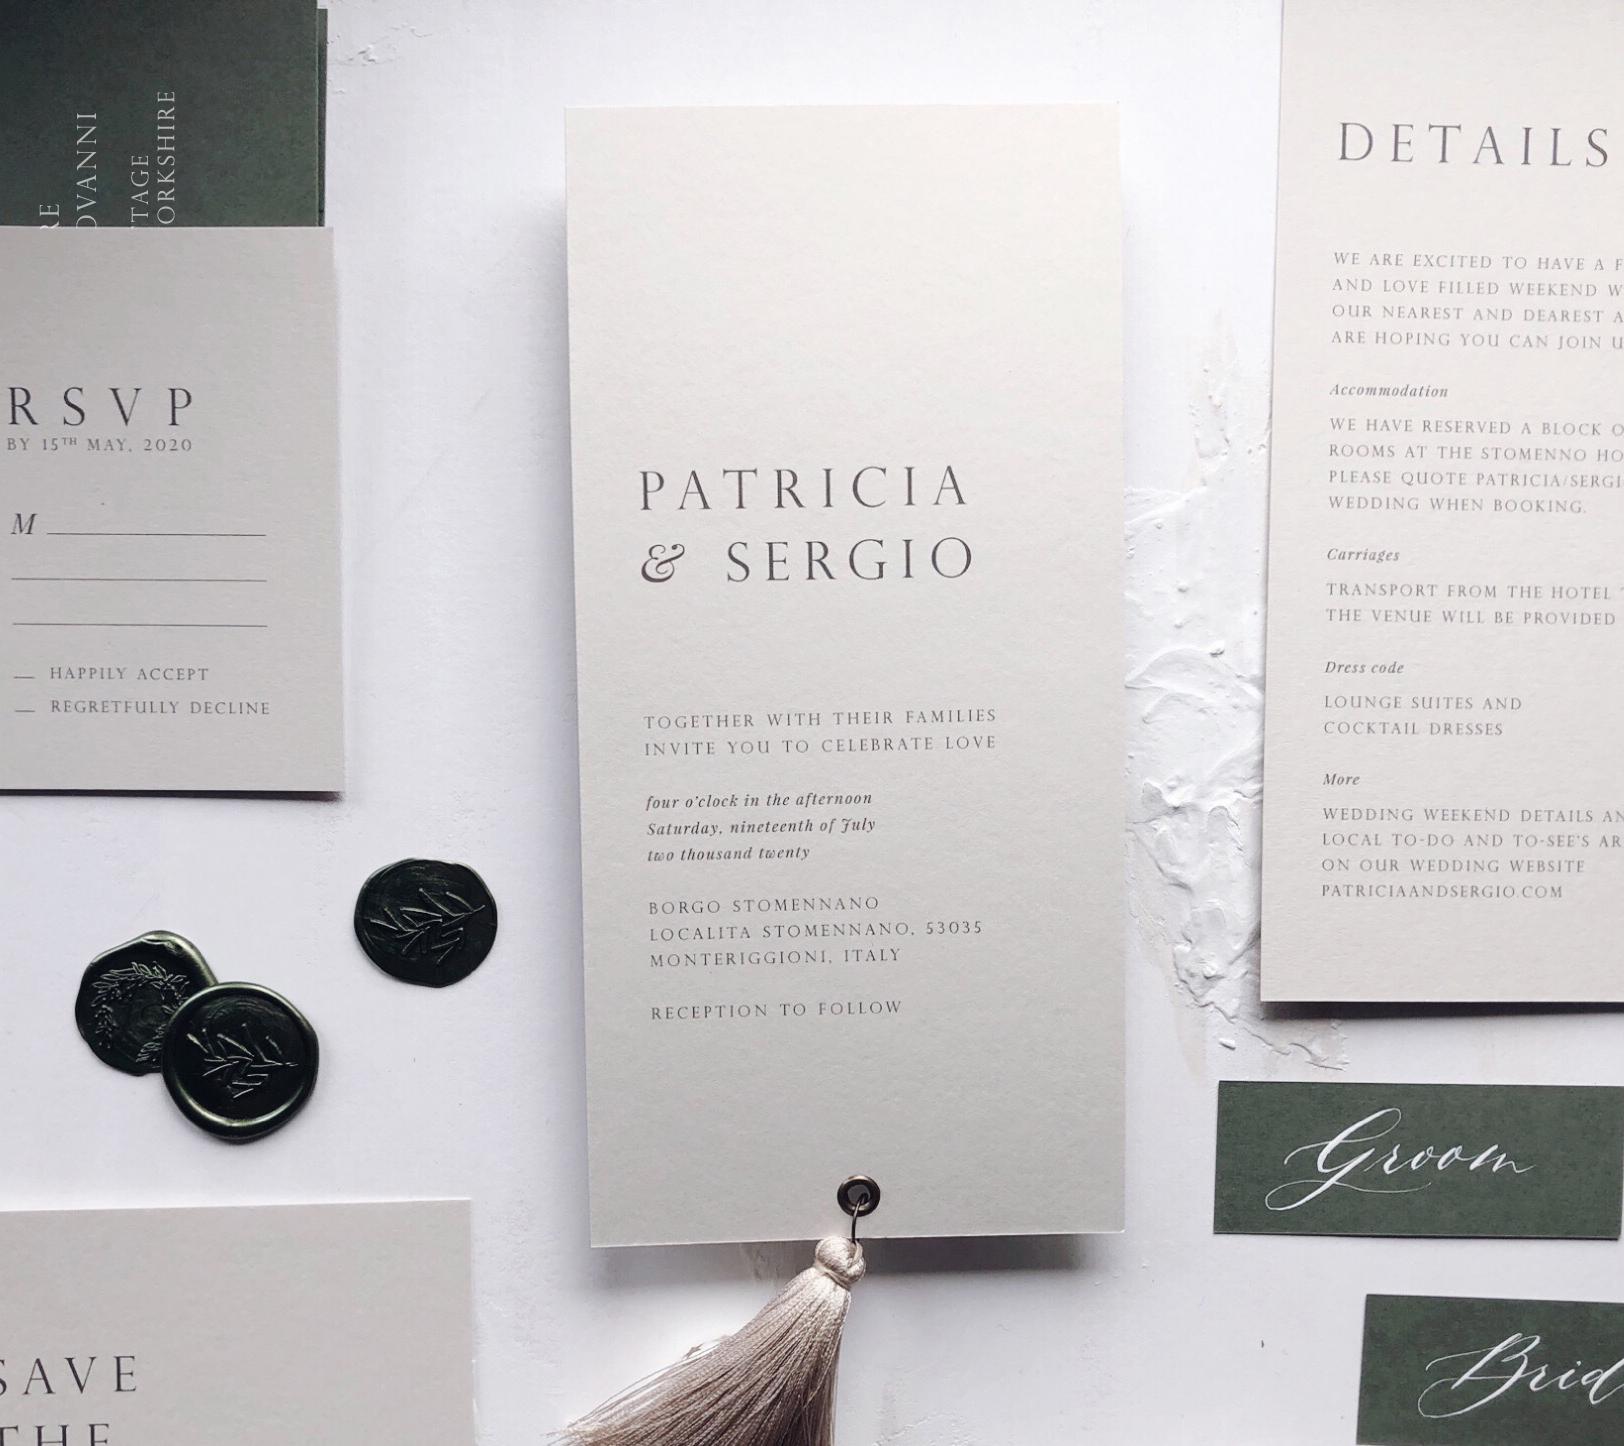 mnodern_wedding_invitations_with_tassel